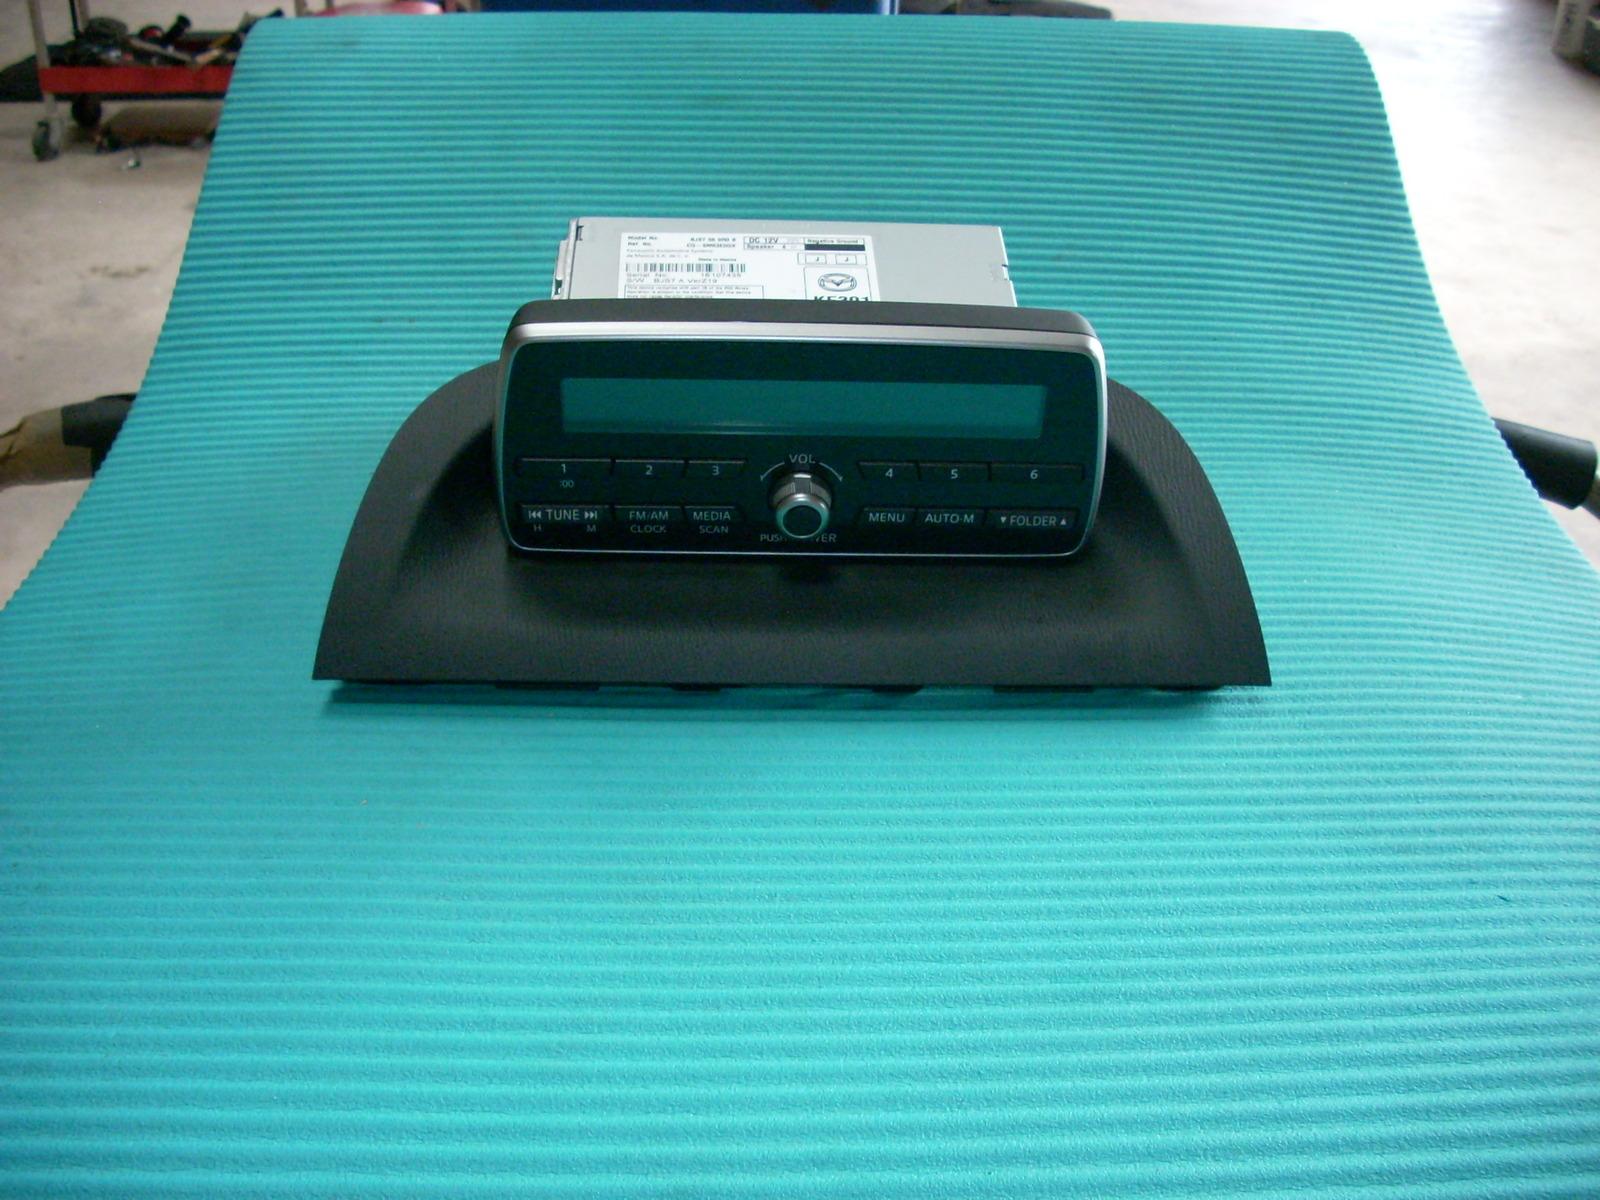 2014 MAZDA 3 RADIO WITH DISPLAY AND CONTROLS  BJS7669R0